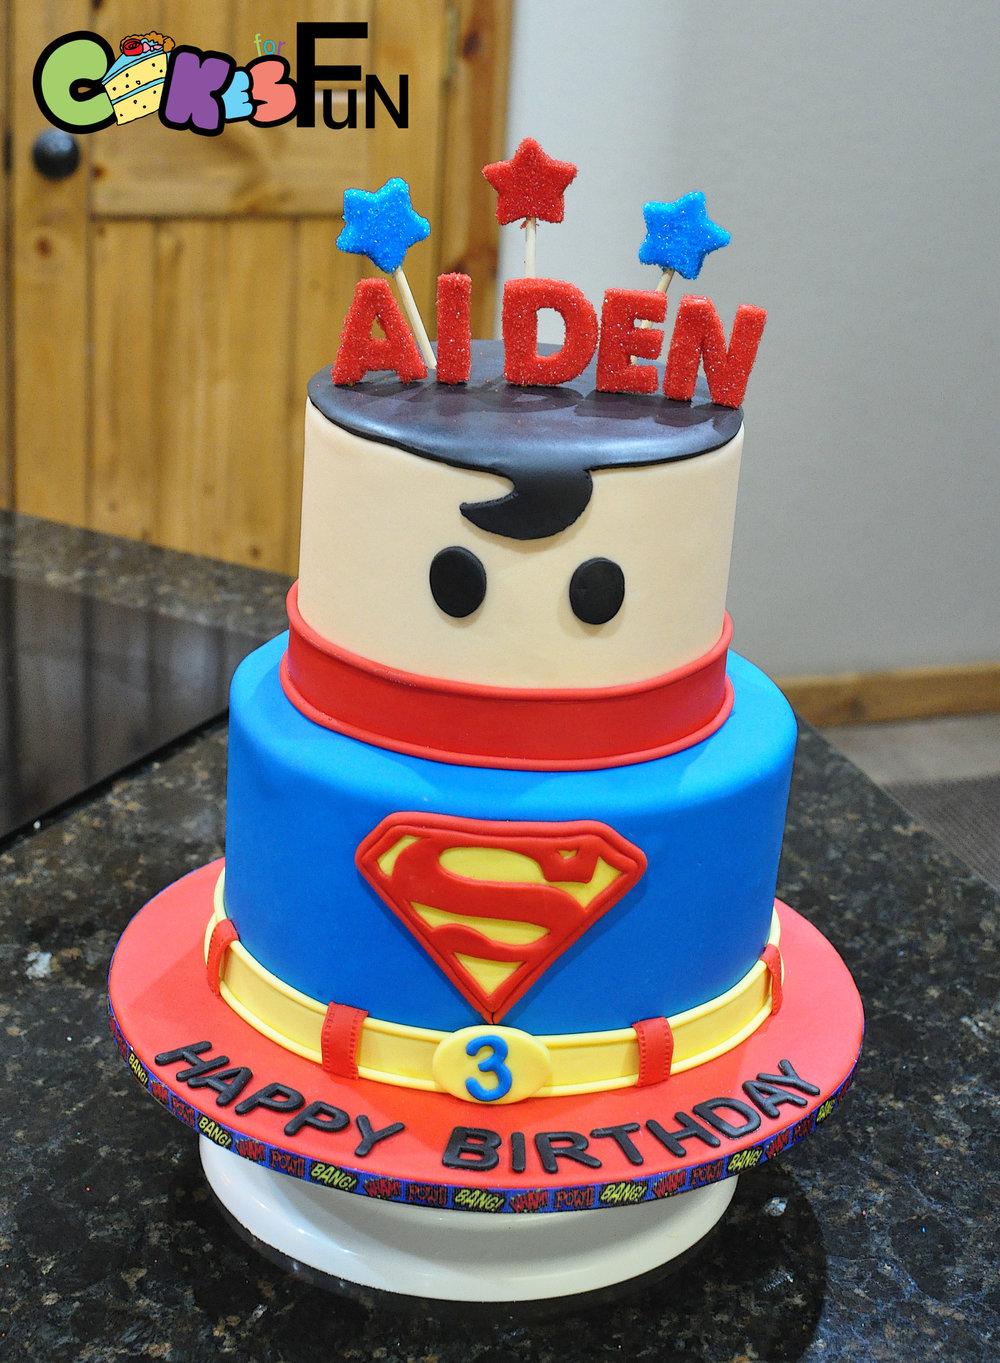 Superman cake.jpg